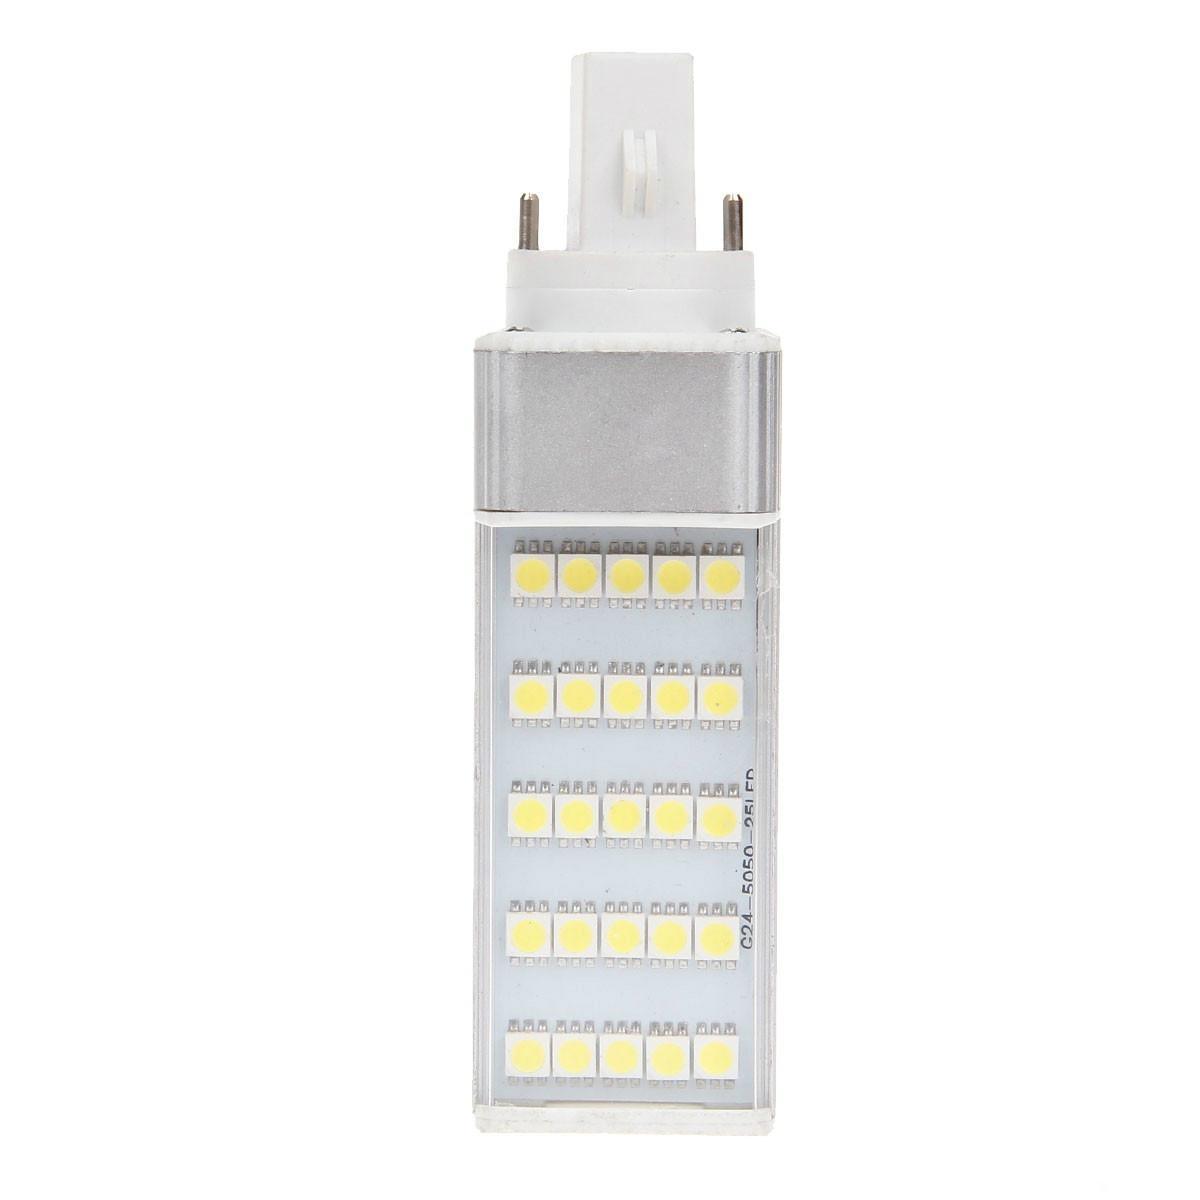 Top Quality G24/E27 SMD LED Chip Energy Saving LED Plc Lamp 3